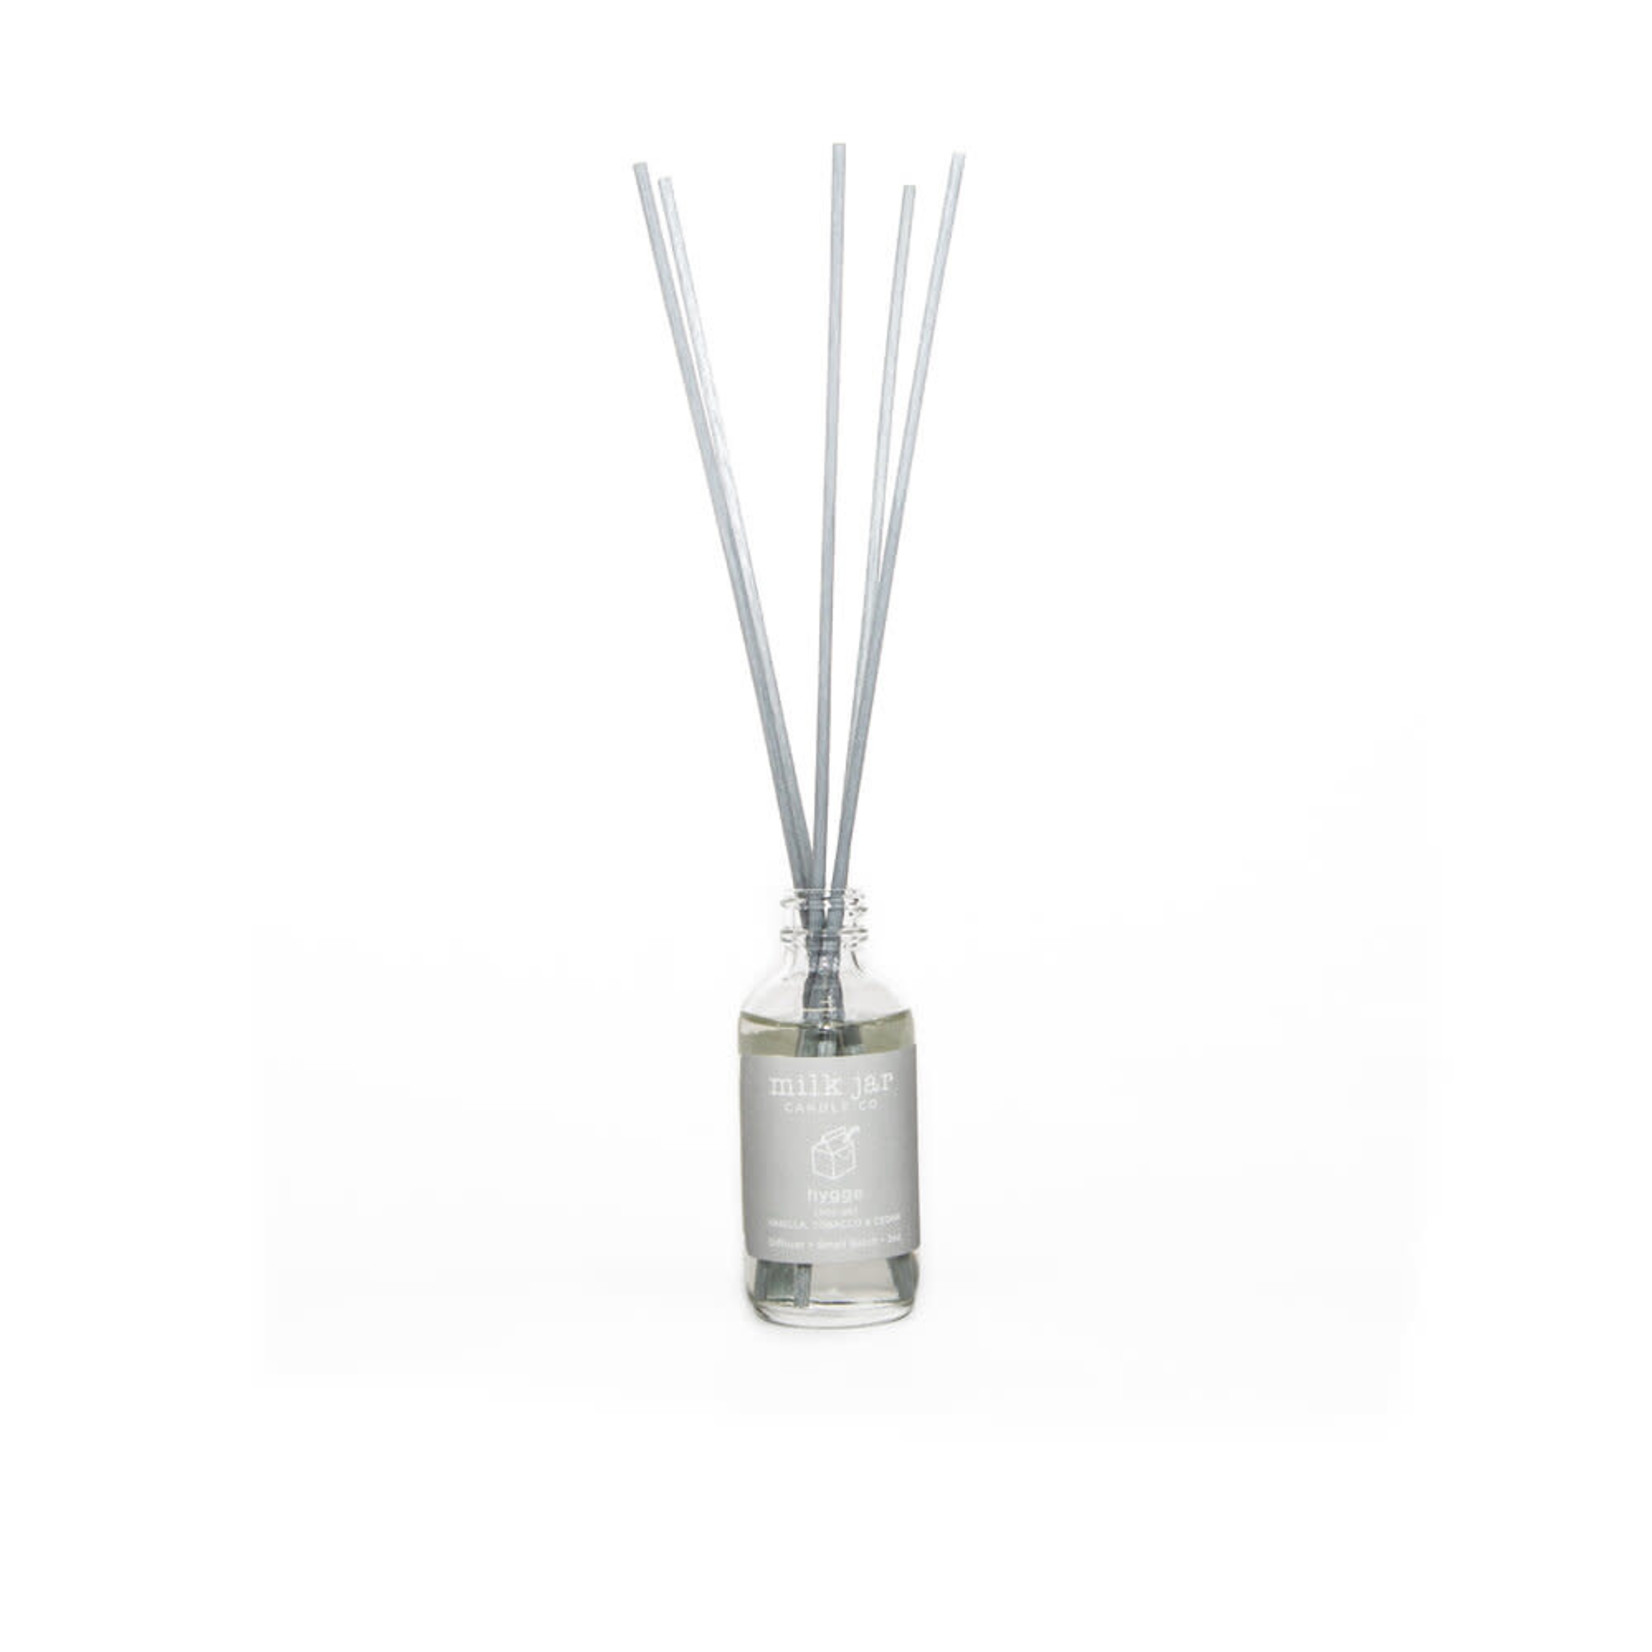 Milk Jar Candle Co. Milk Jar Candle Co. - DIFFUSER Hygge